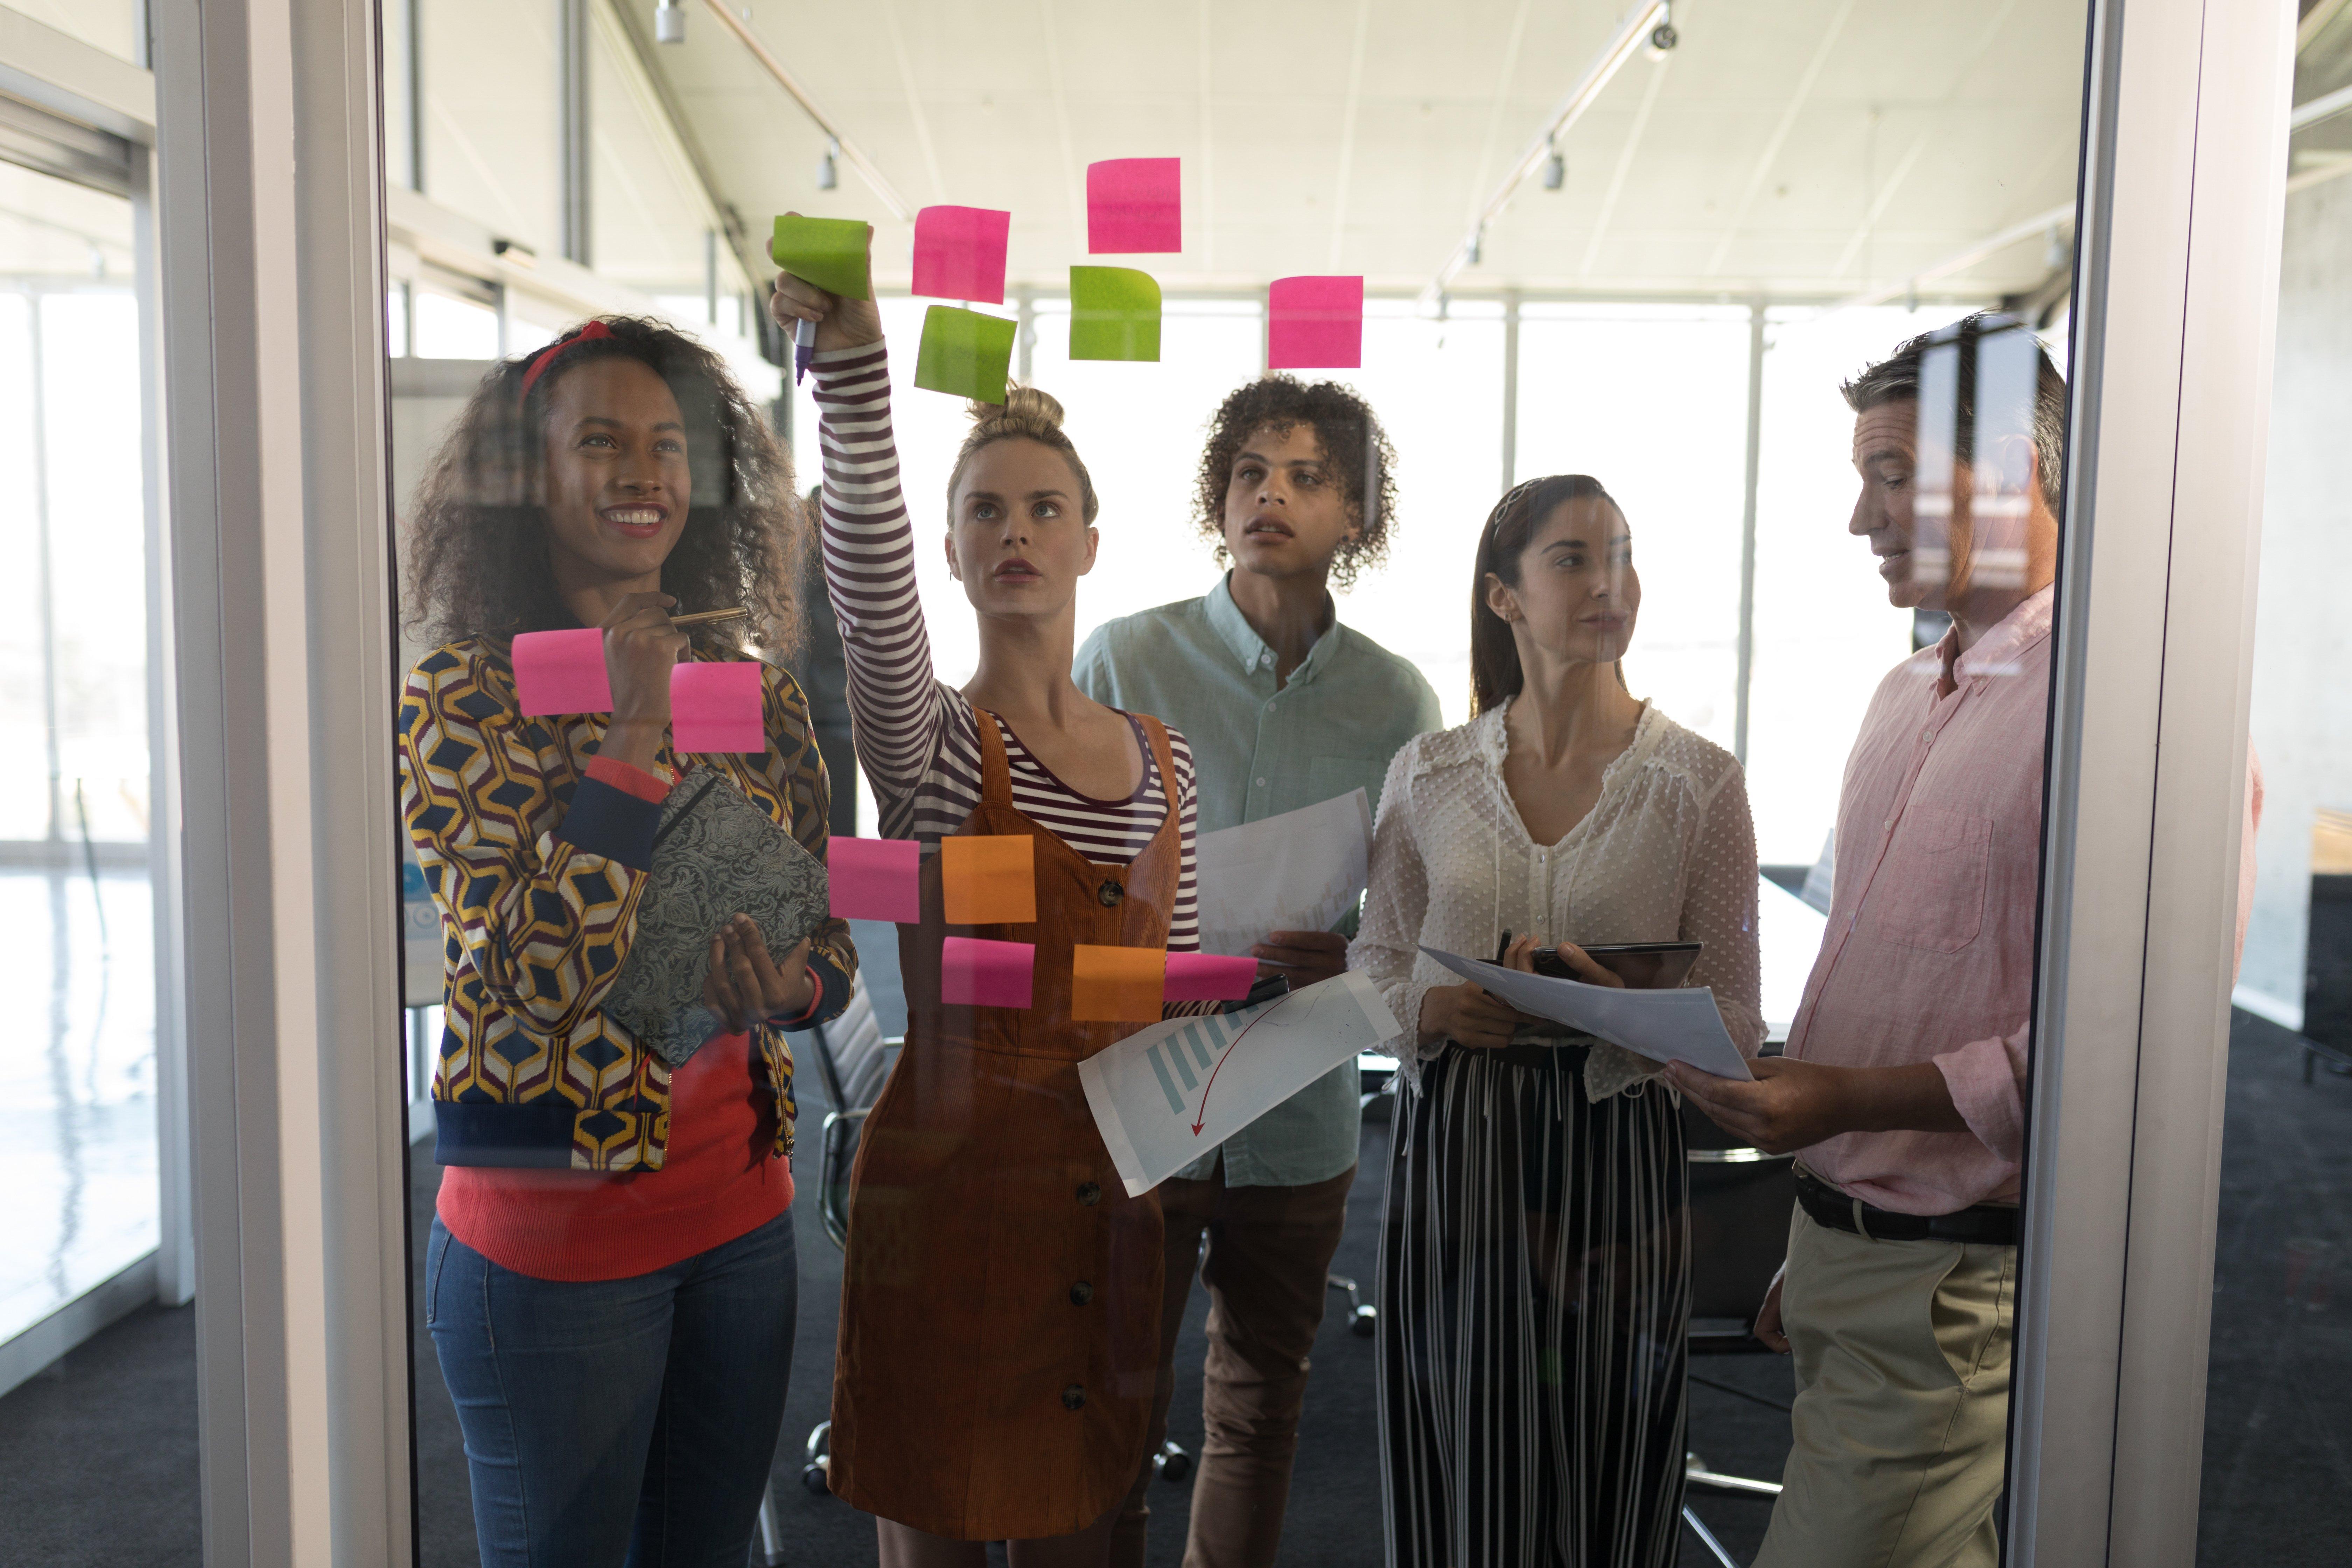 happy-creative-business-team-celebrating-success-A8Q38HY